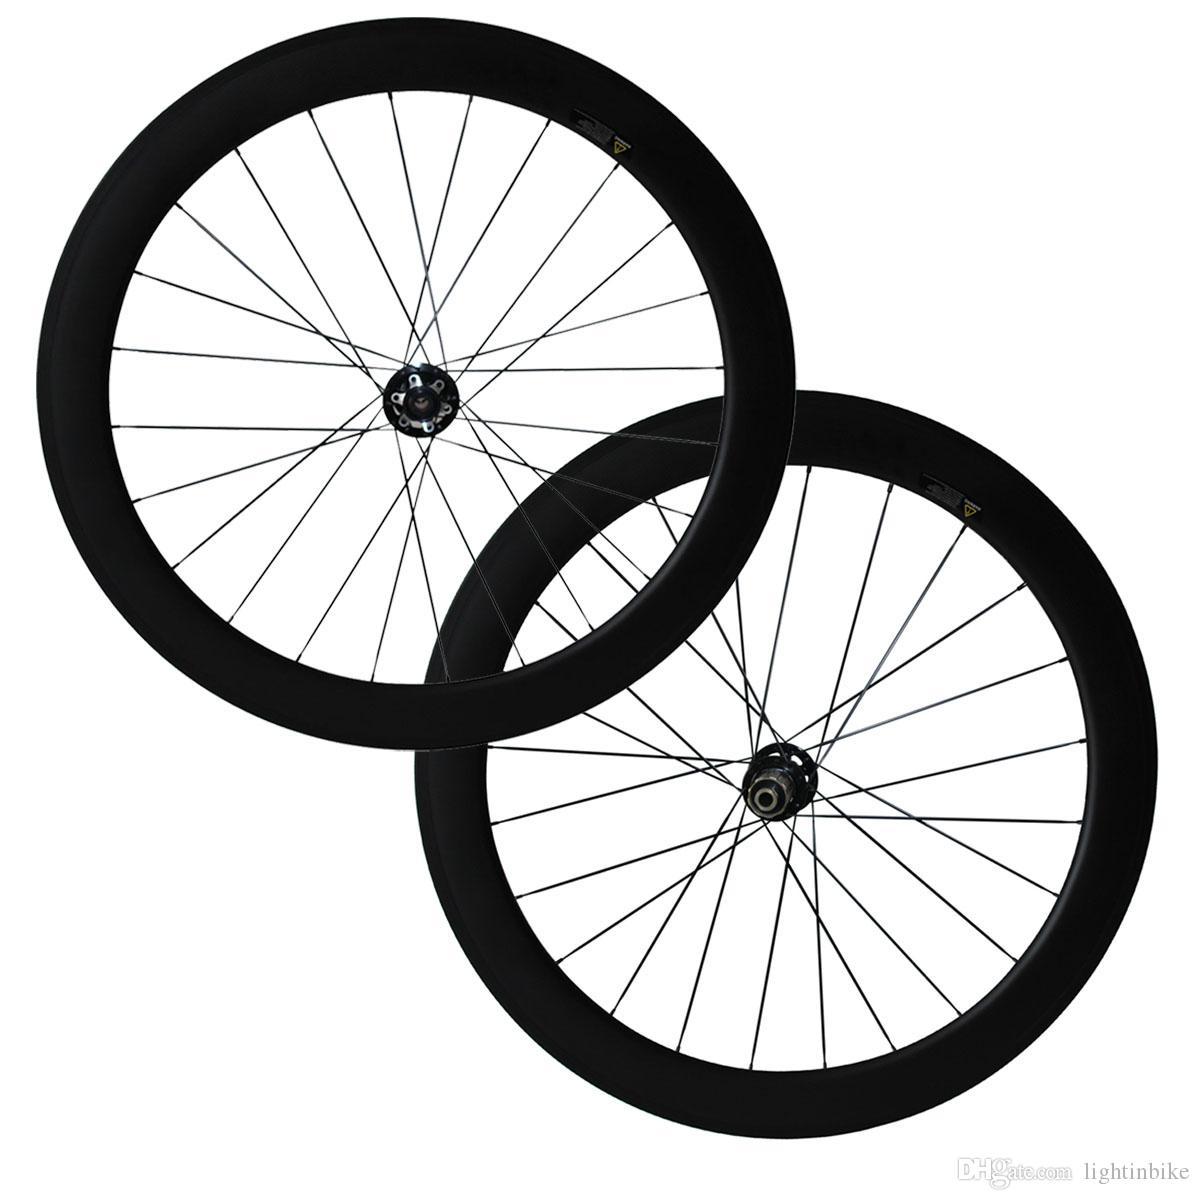 80mm Disc brake Road bike Wheel Carbon Rear Rim Clincher 700C Matt Race 6 bolts